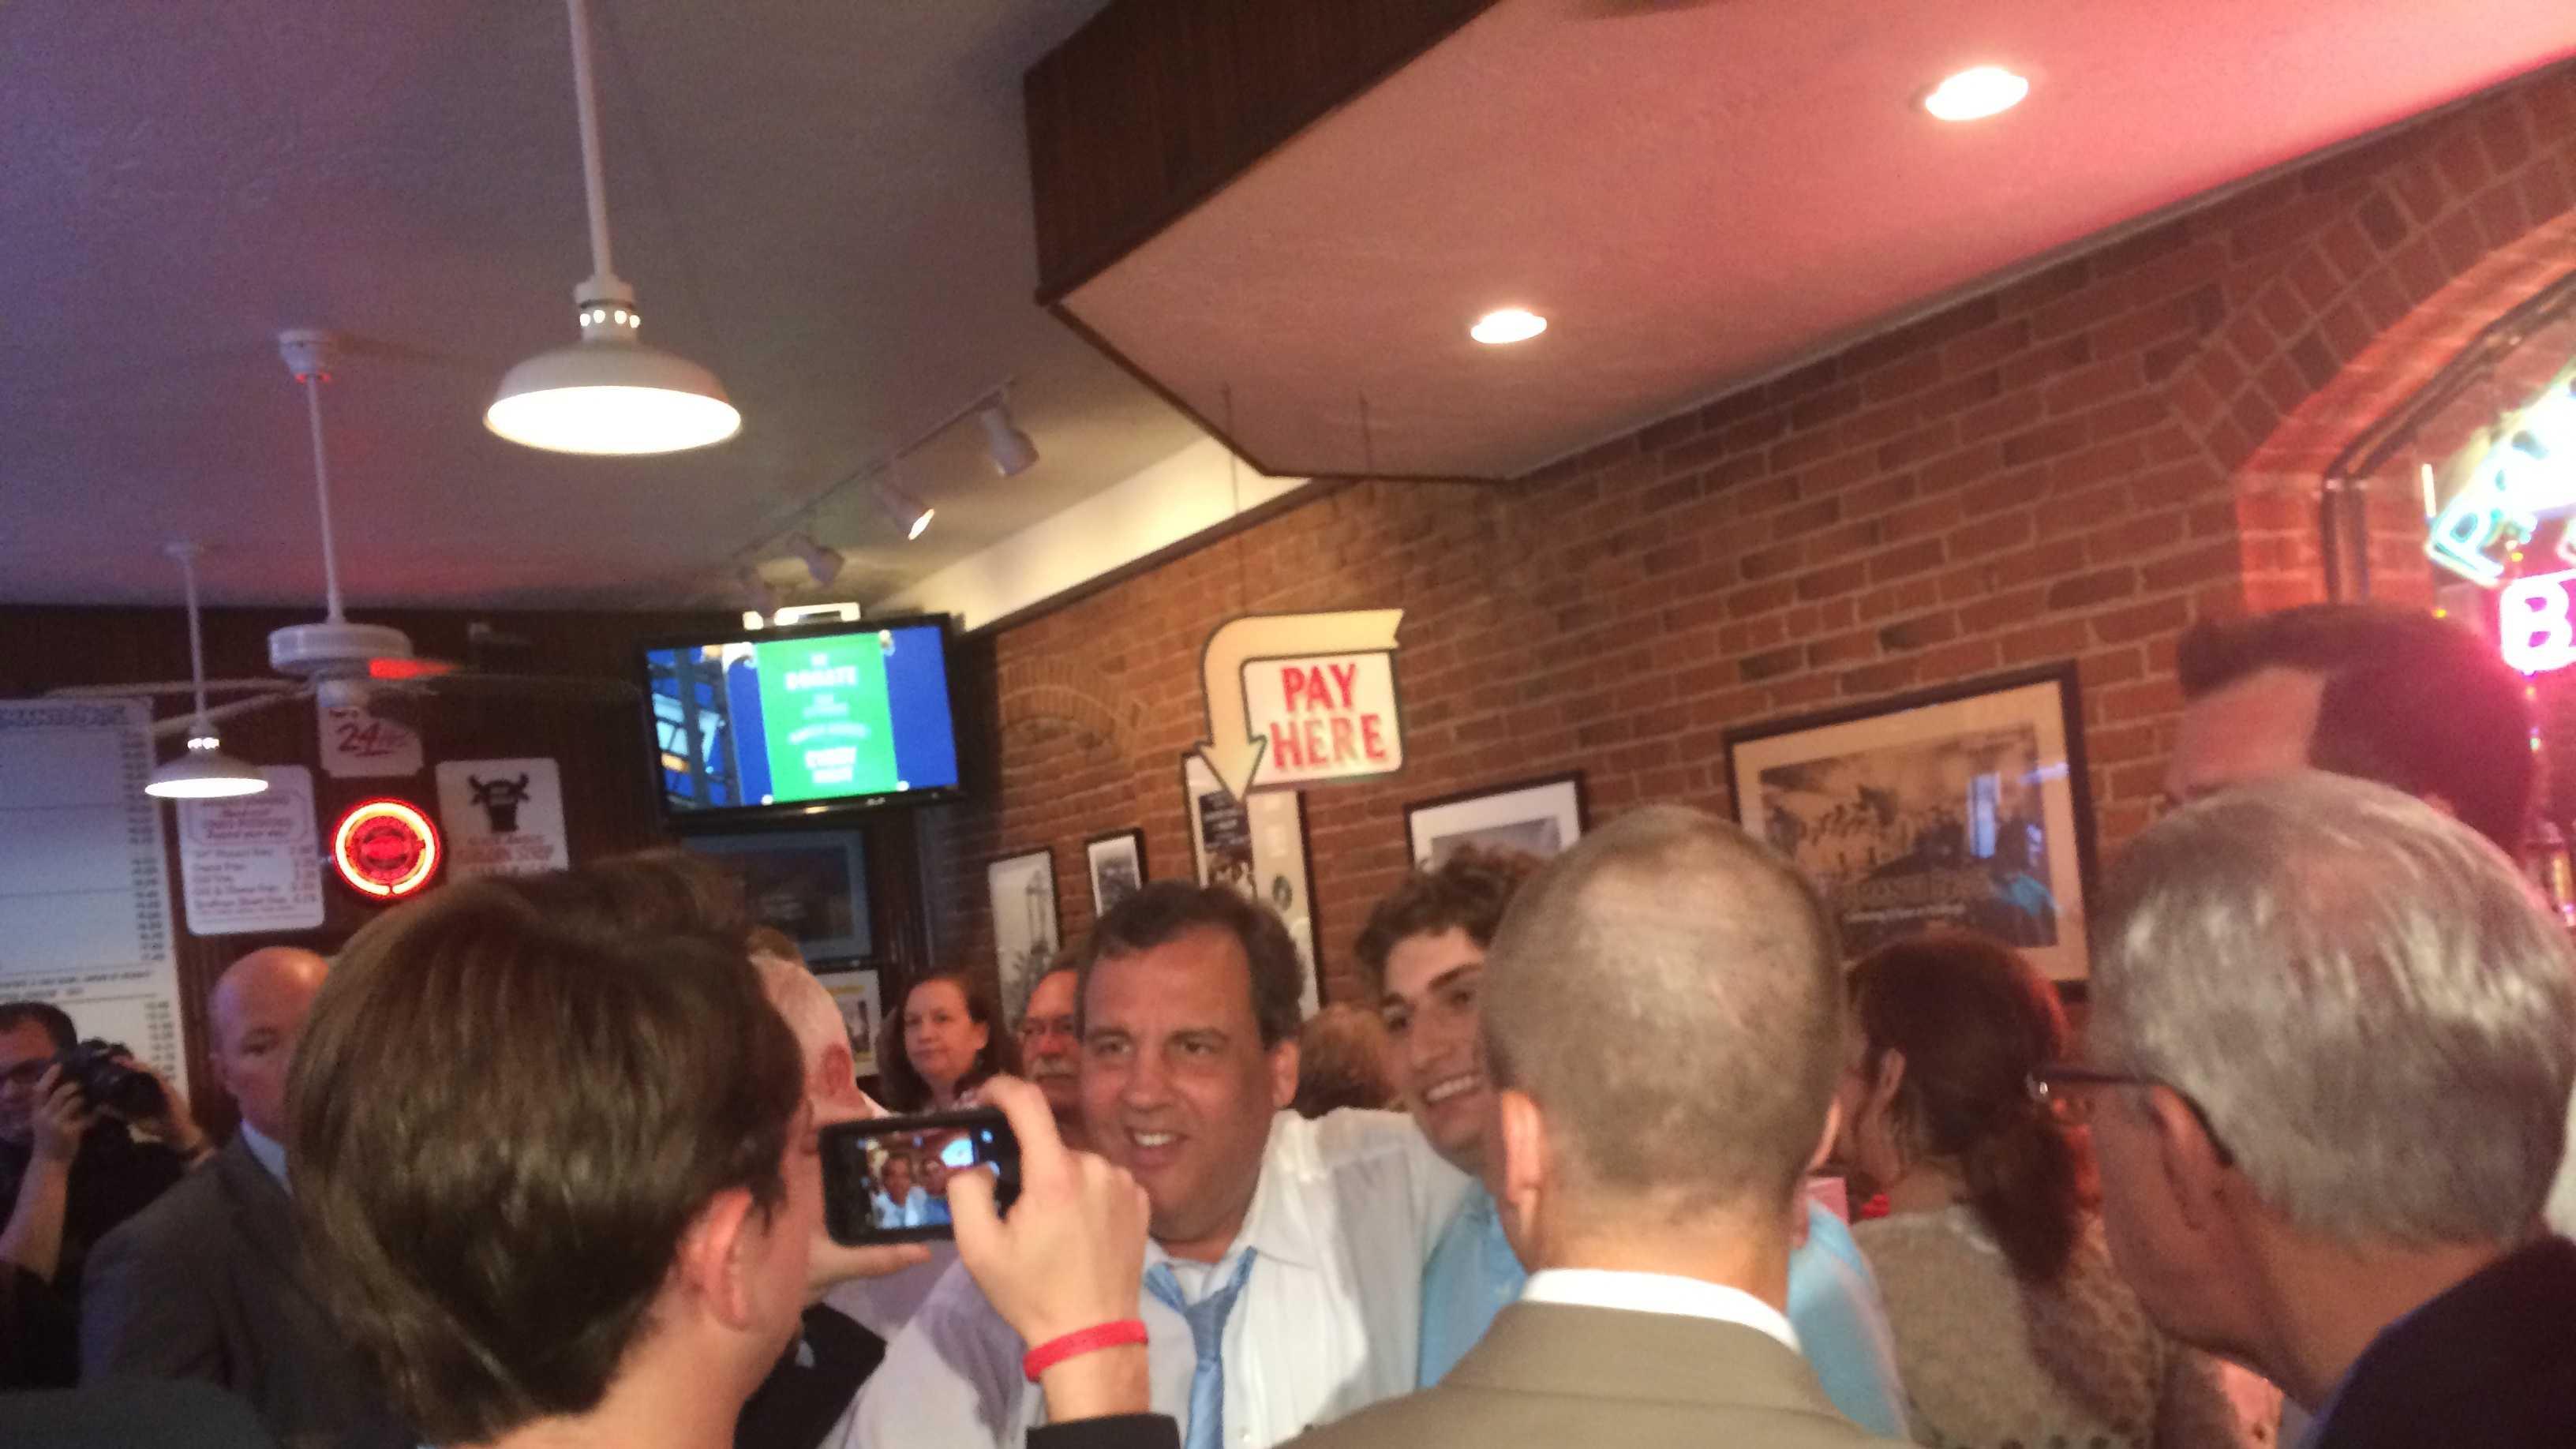 New Jersey Gov. Chris Christie campaigns with Pennsylvania Gov. Tom Corbett at Primanti Bros.